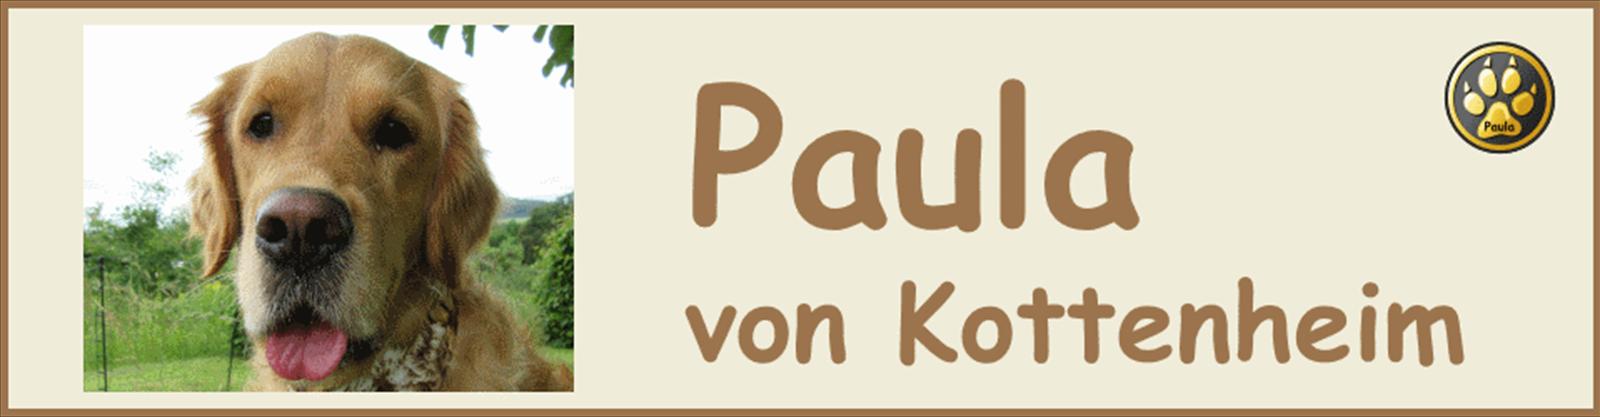 Paula-Banner-10